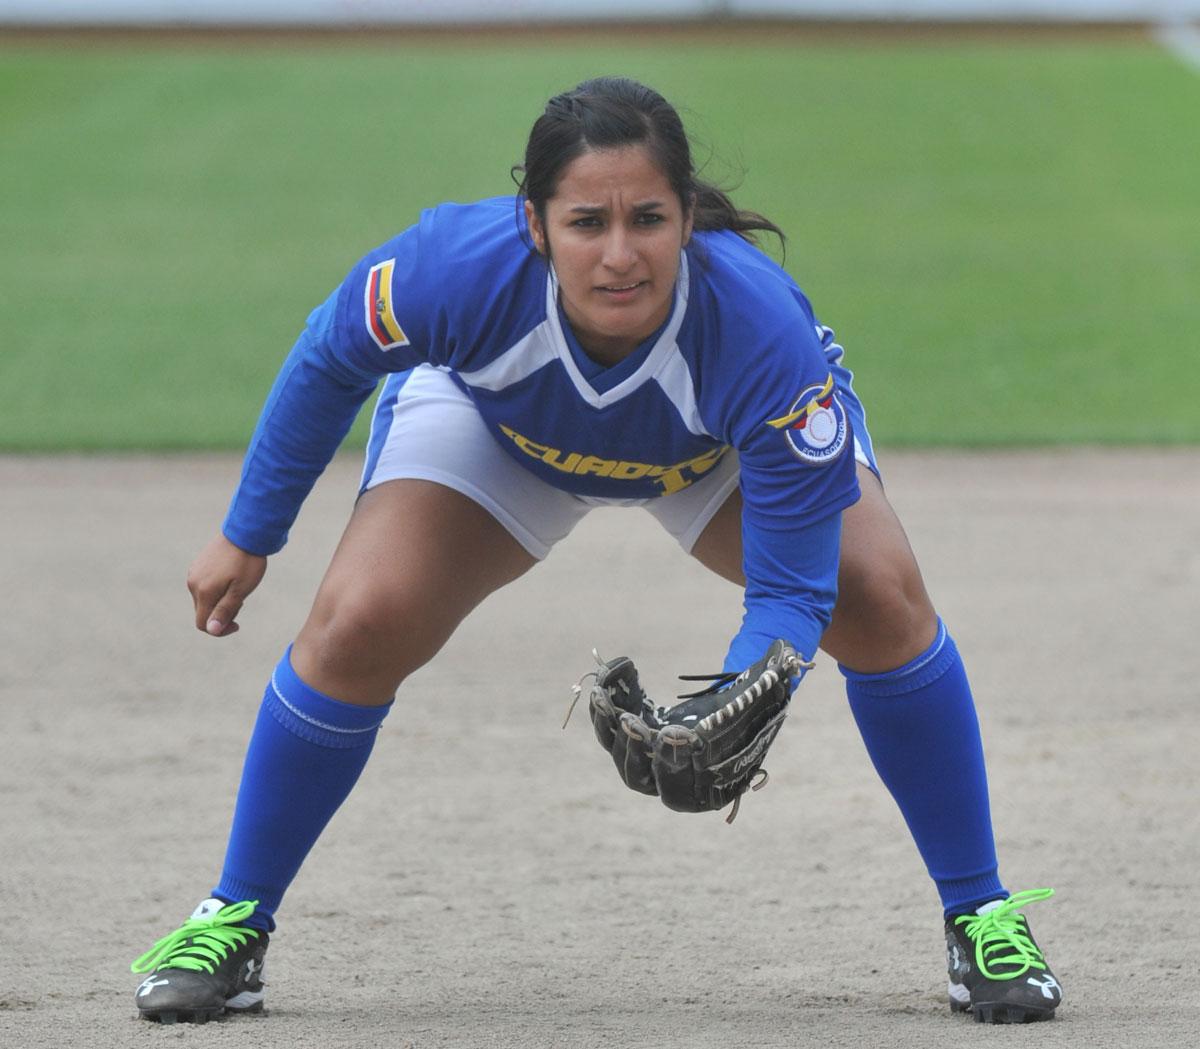 Campeonato Mundial de Softbol Femenino 2016 – 8o. Dia Resumen de Juegos